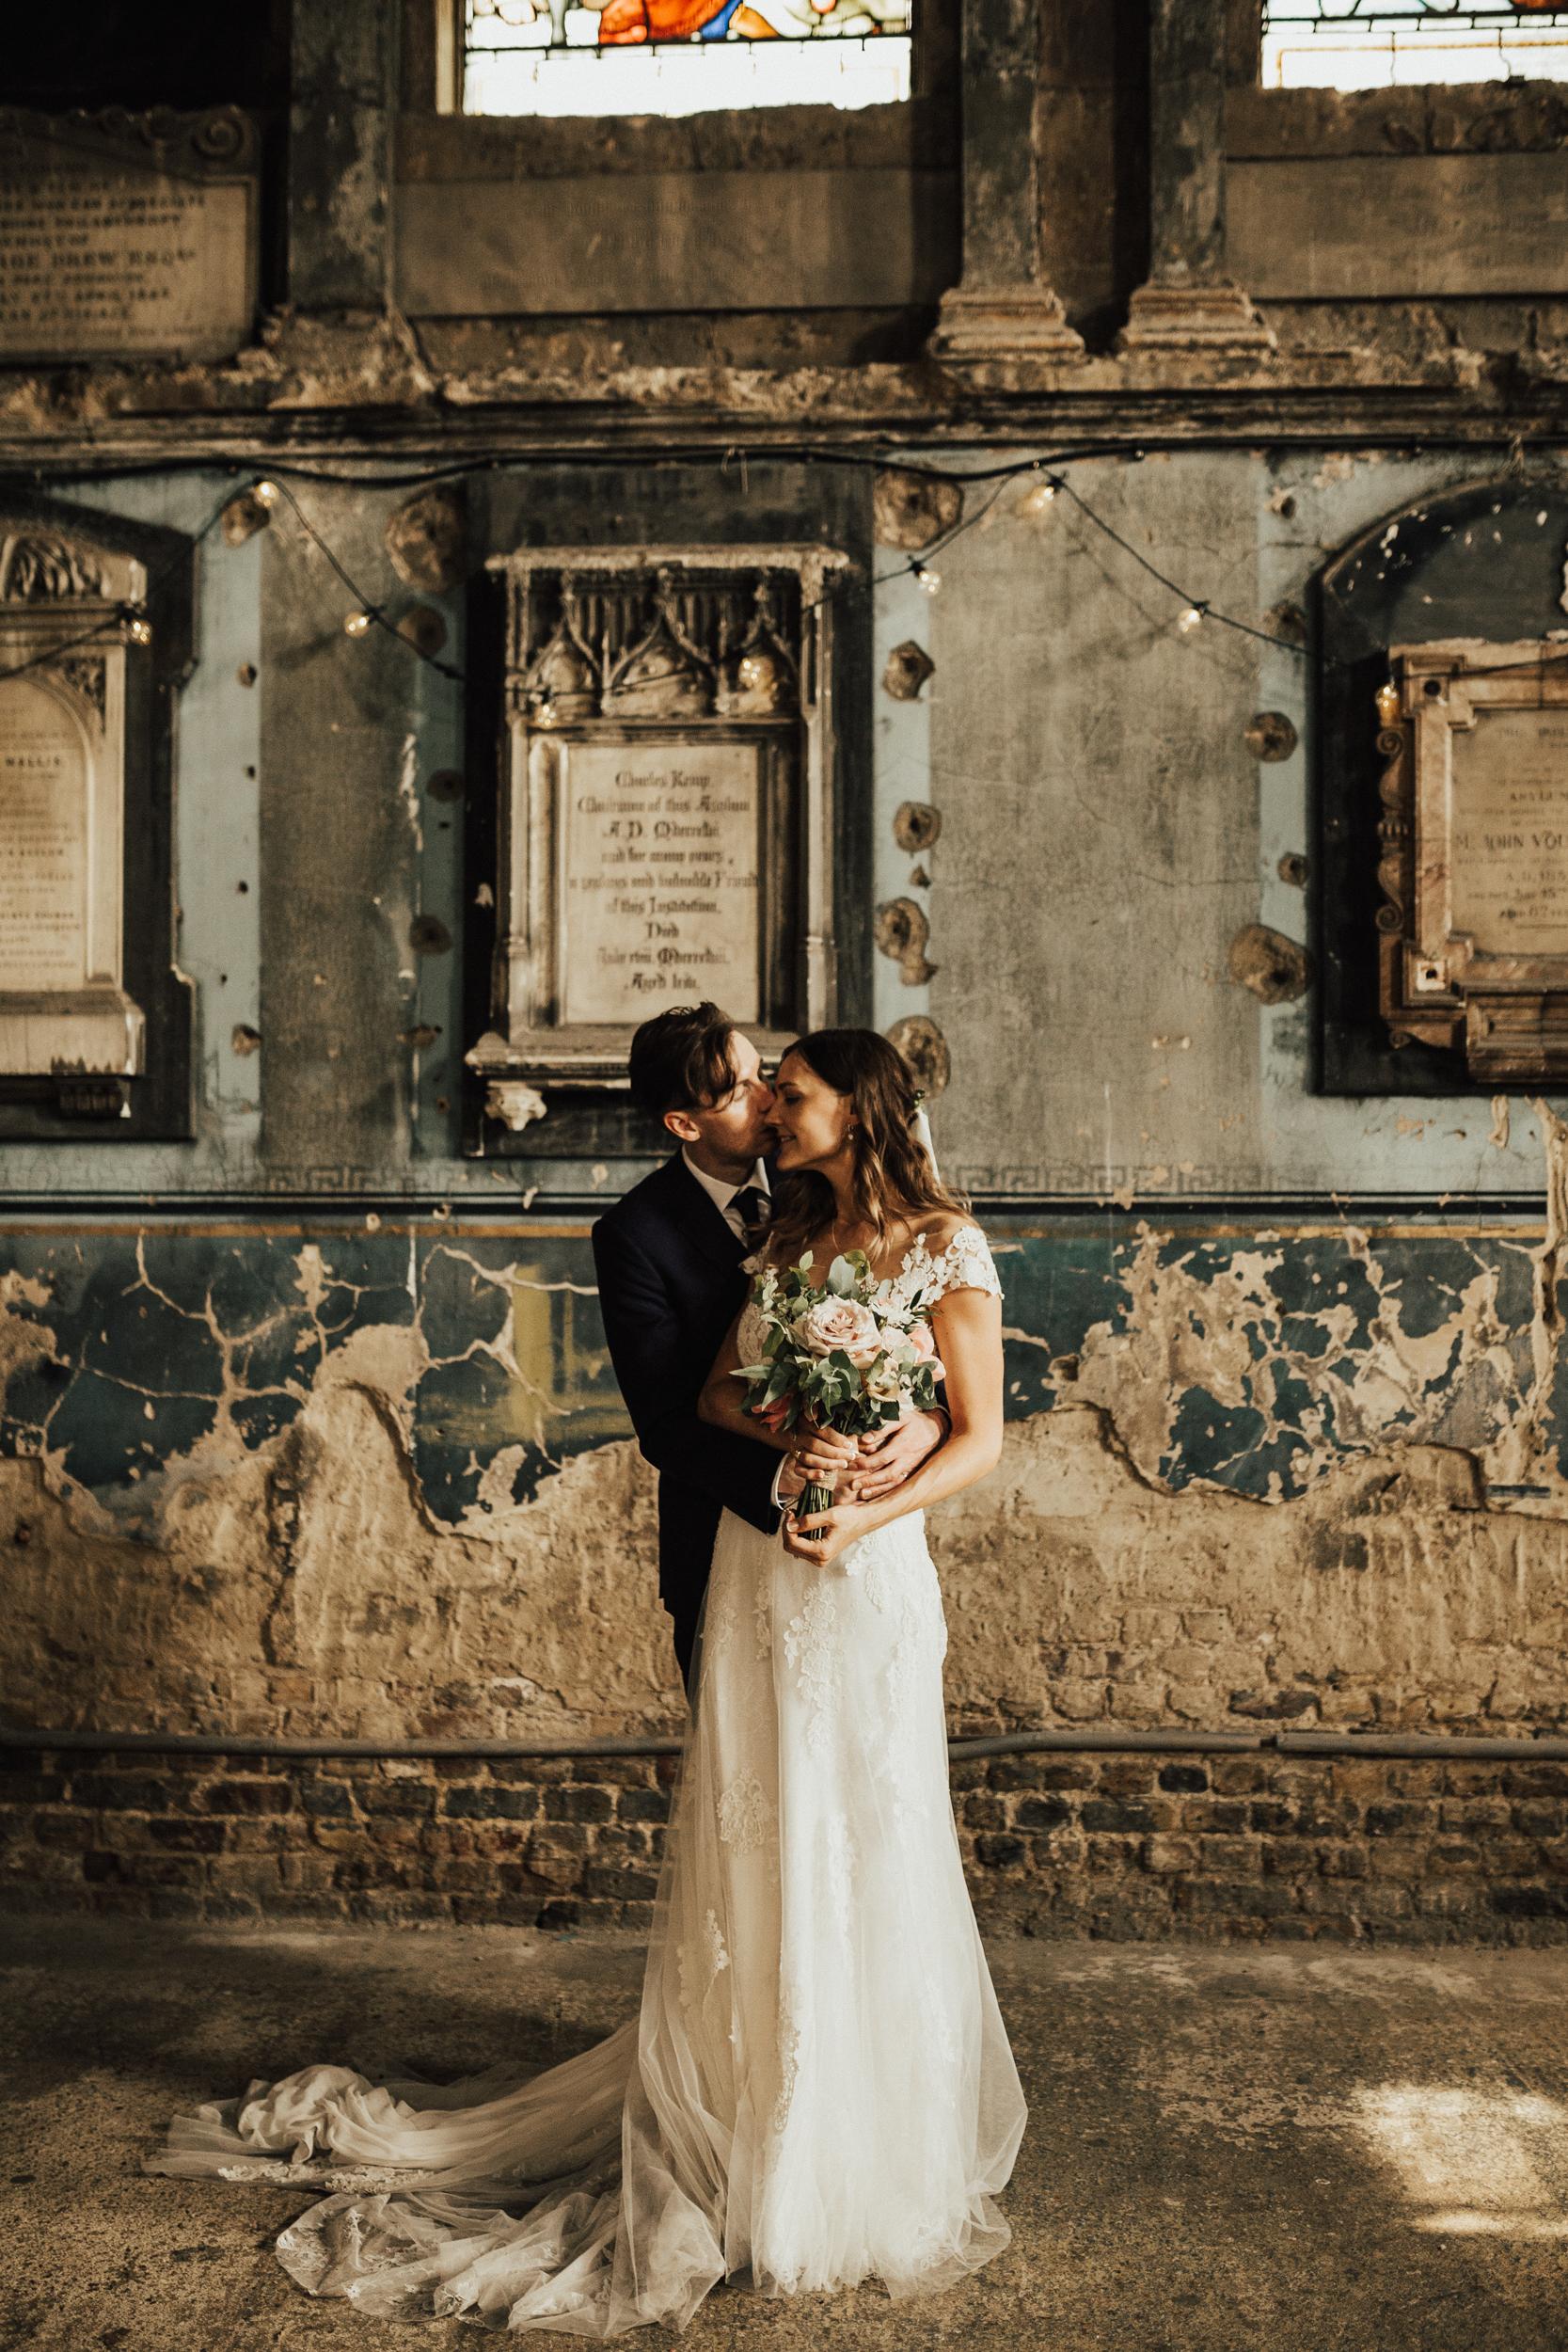 Laura-Benn-The-Asylum-London-The-Ace-Hotel-Wedding-Alternative-Darina-Stoda-Photography-346.jpg